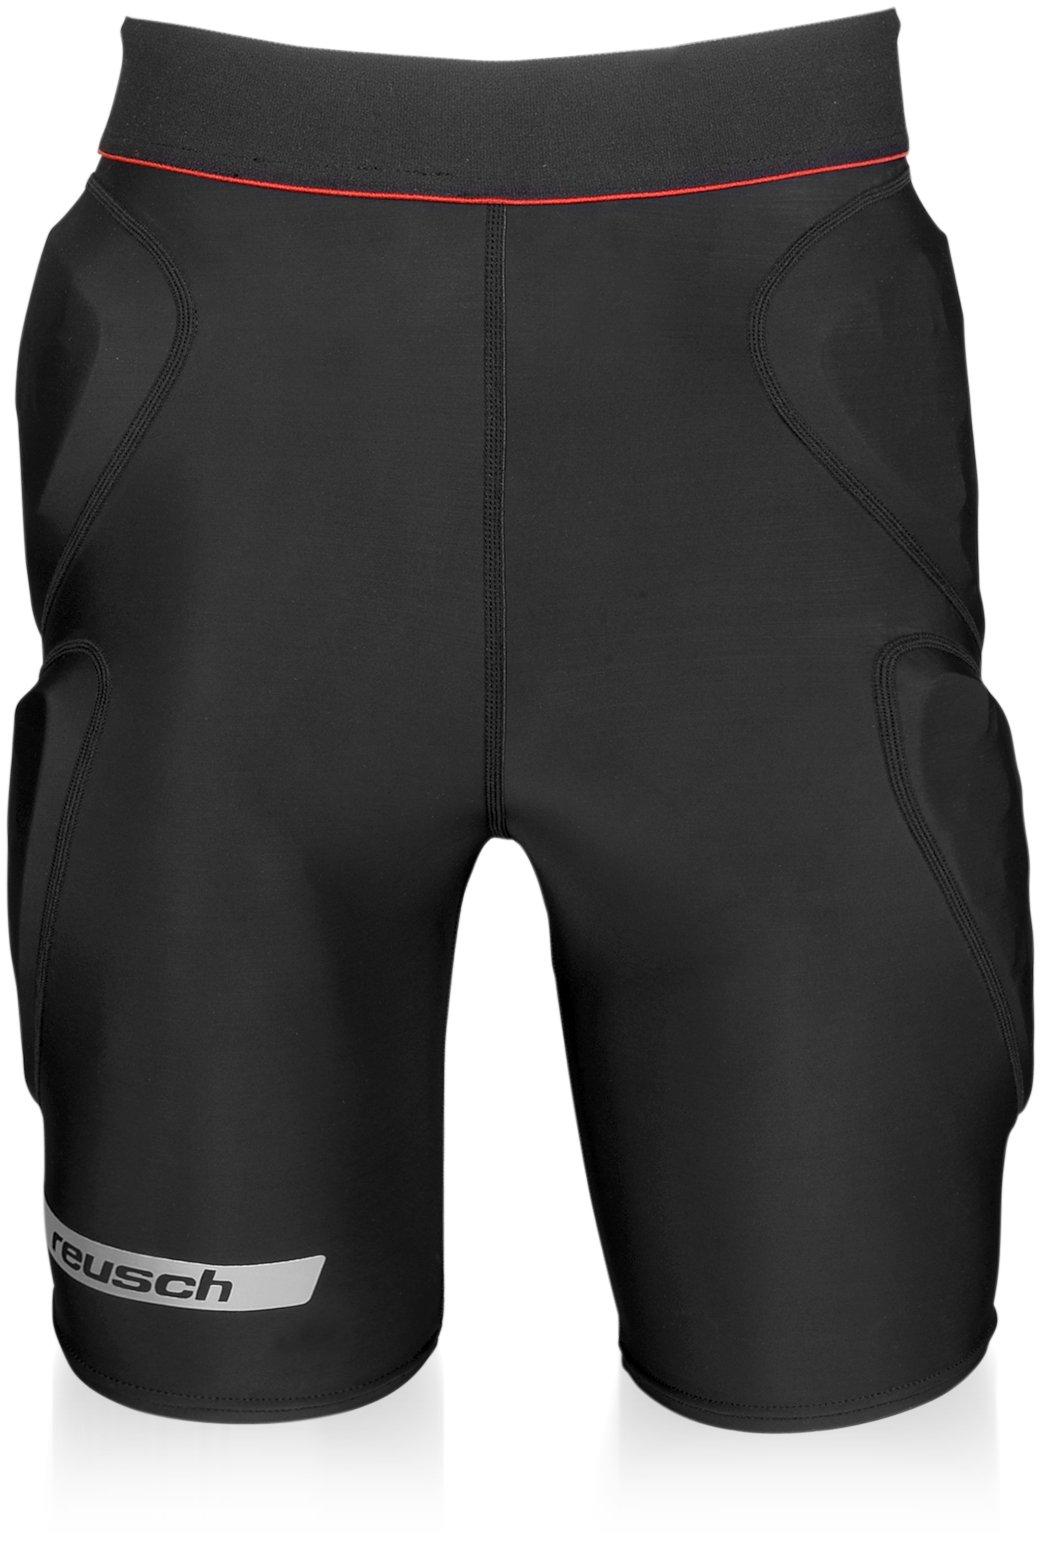 Reusch Adult CS Padded Shorts, Black/Red, X-Large